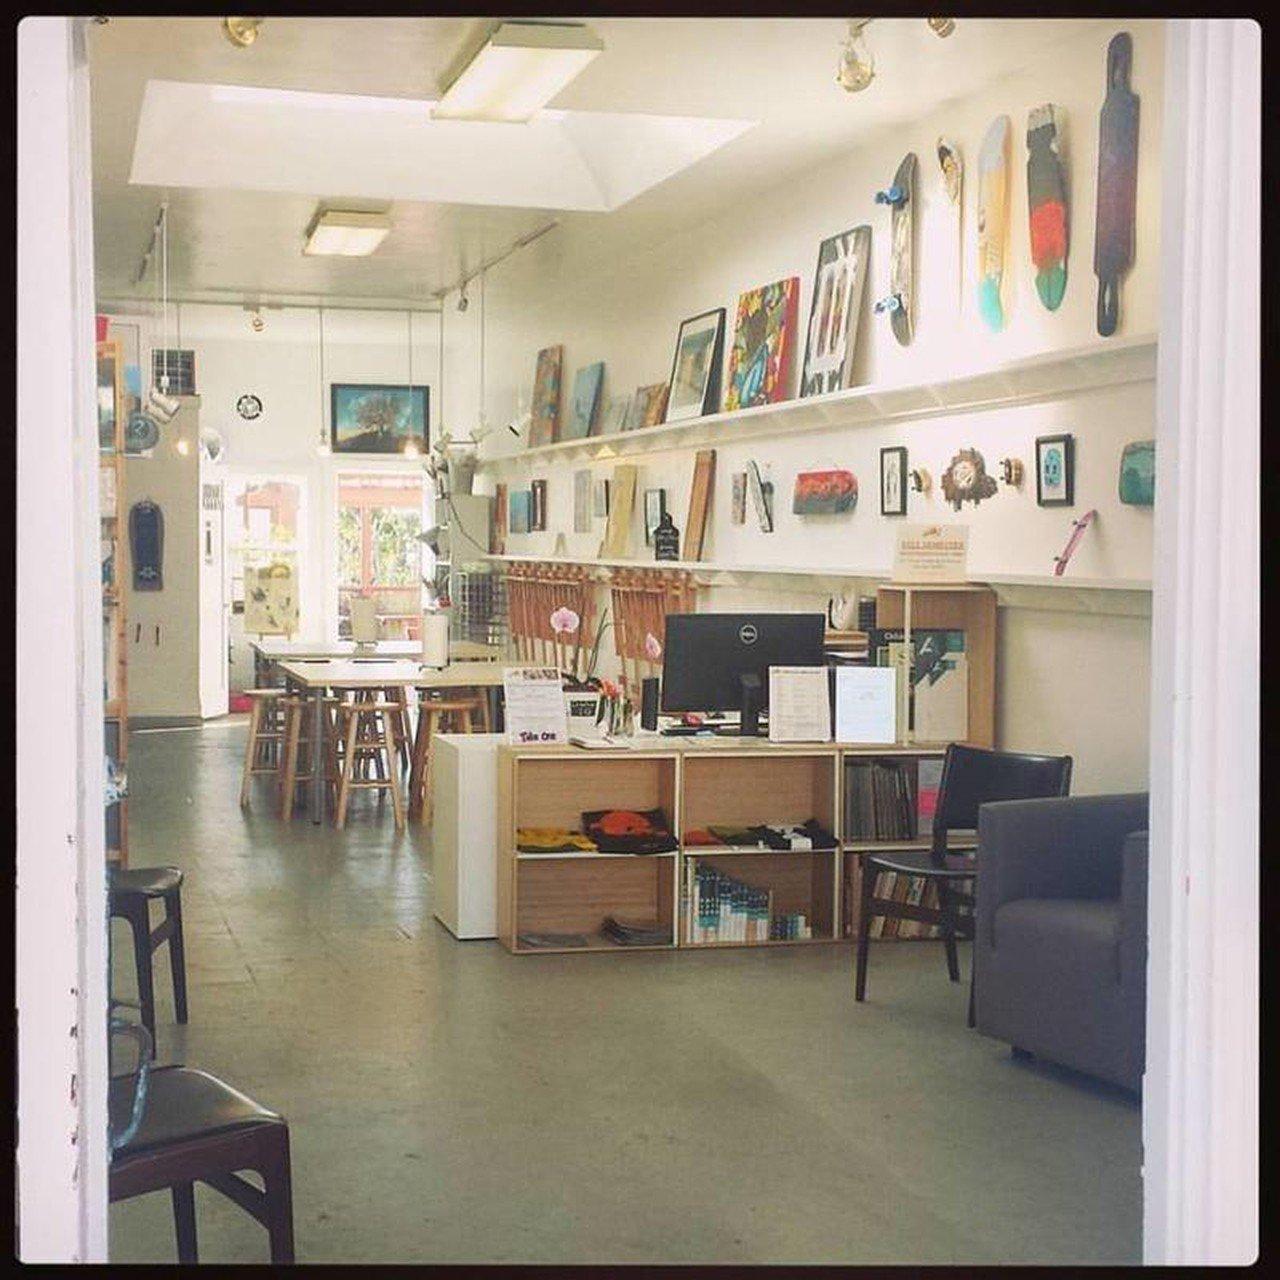 Sf Studios For Rent: Rent Creative IQ Art Studio Suzanne Ferras San Francisco